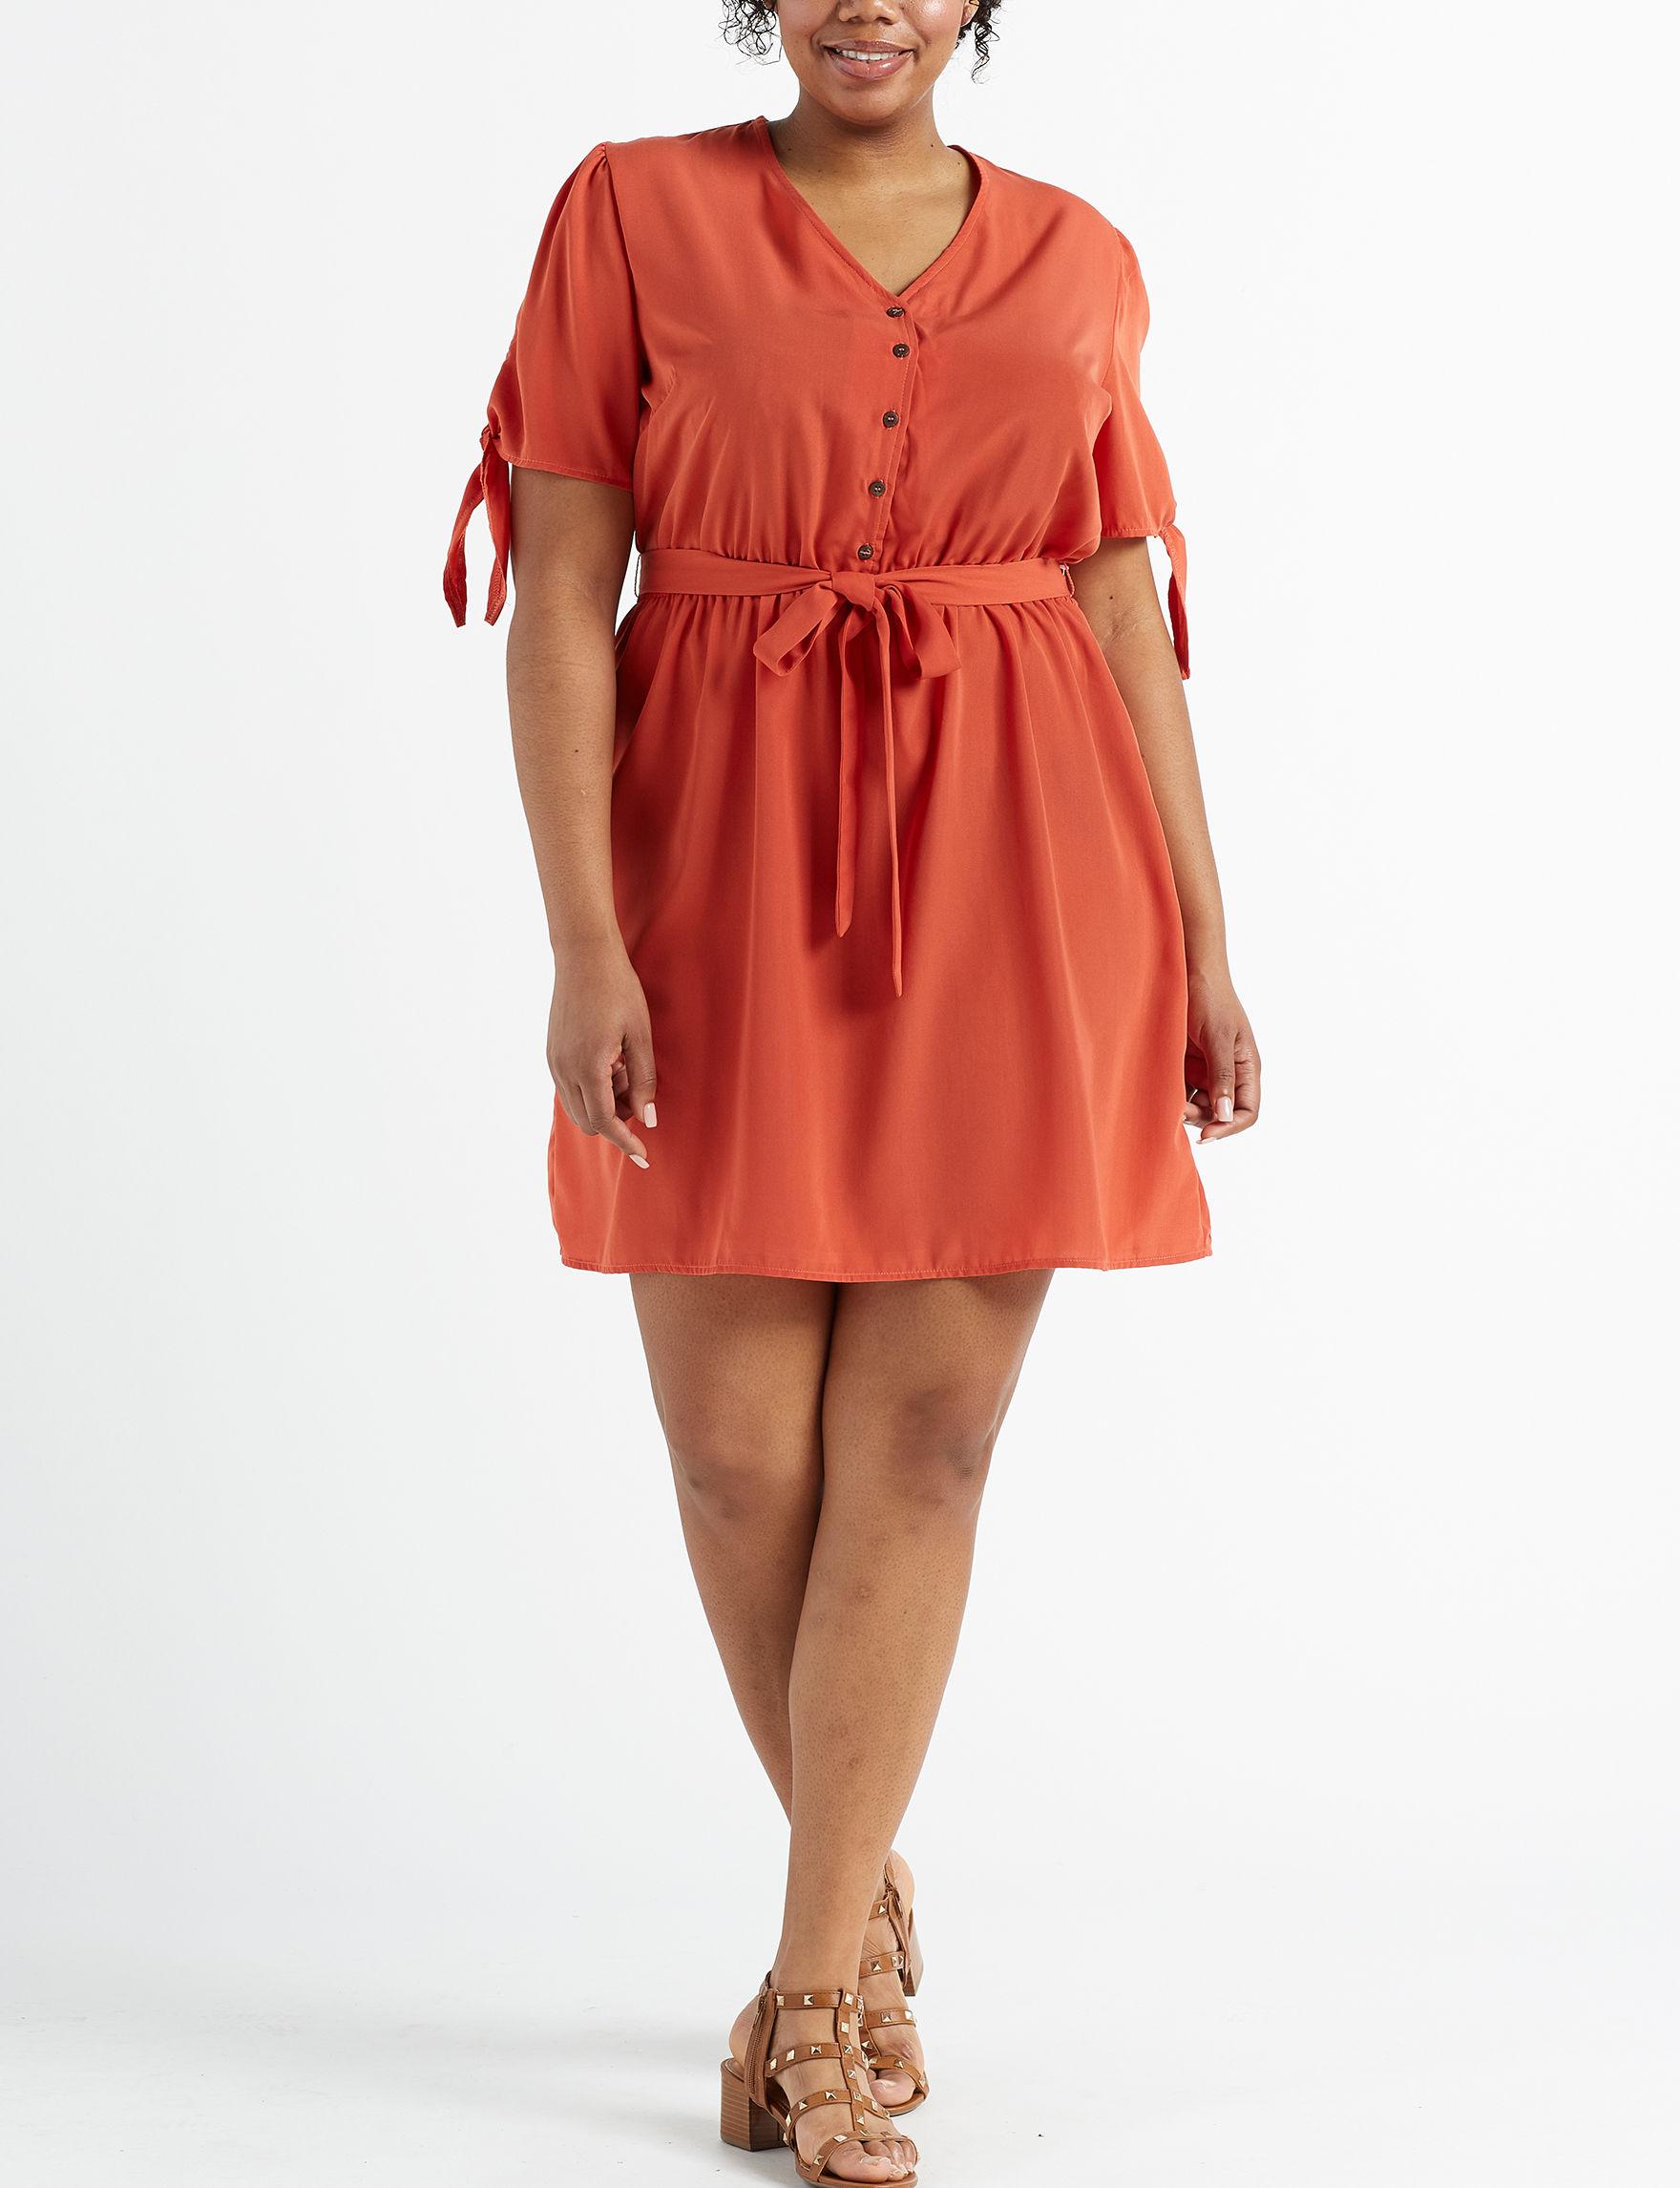 Wishful Park Red Orange Everyday & Casual Shirt Dresses